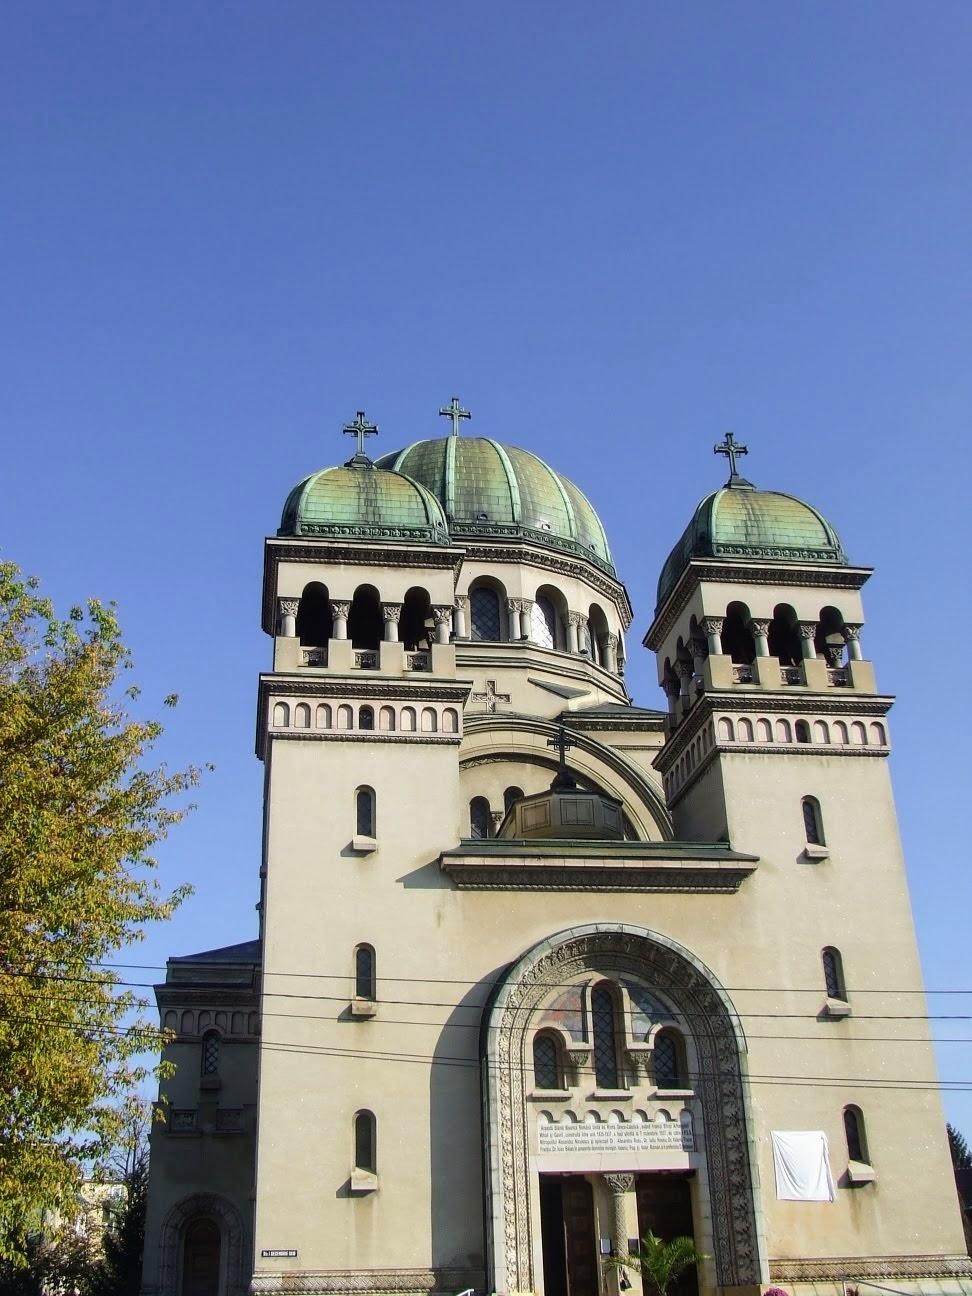 Satu_Mare_Greek_Catholic_Cathedral_5.jpg